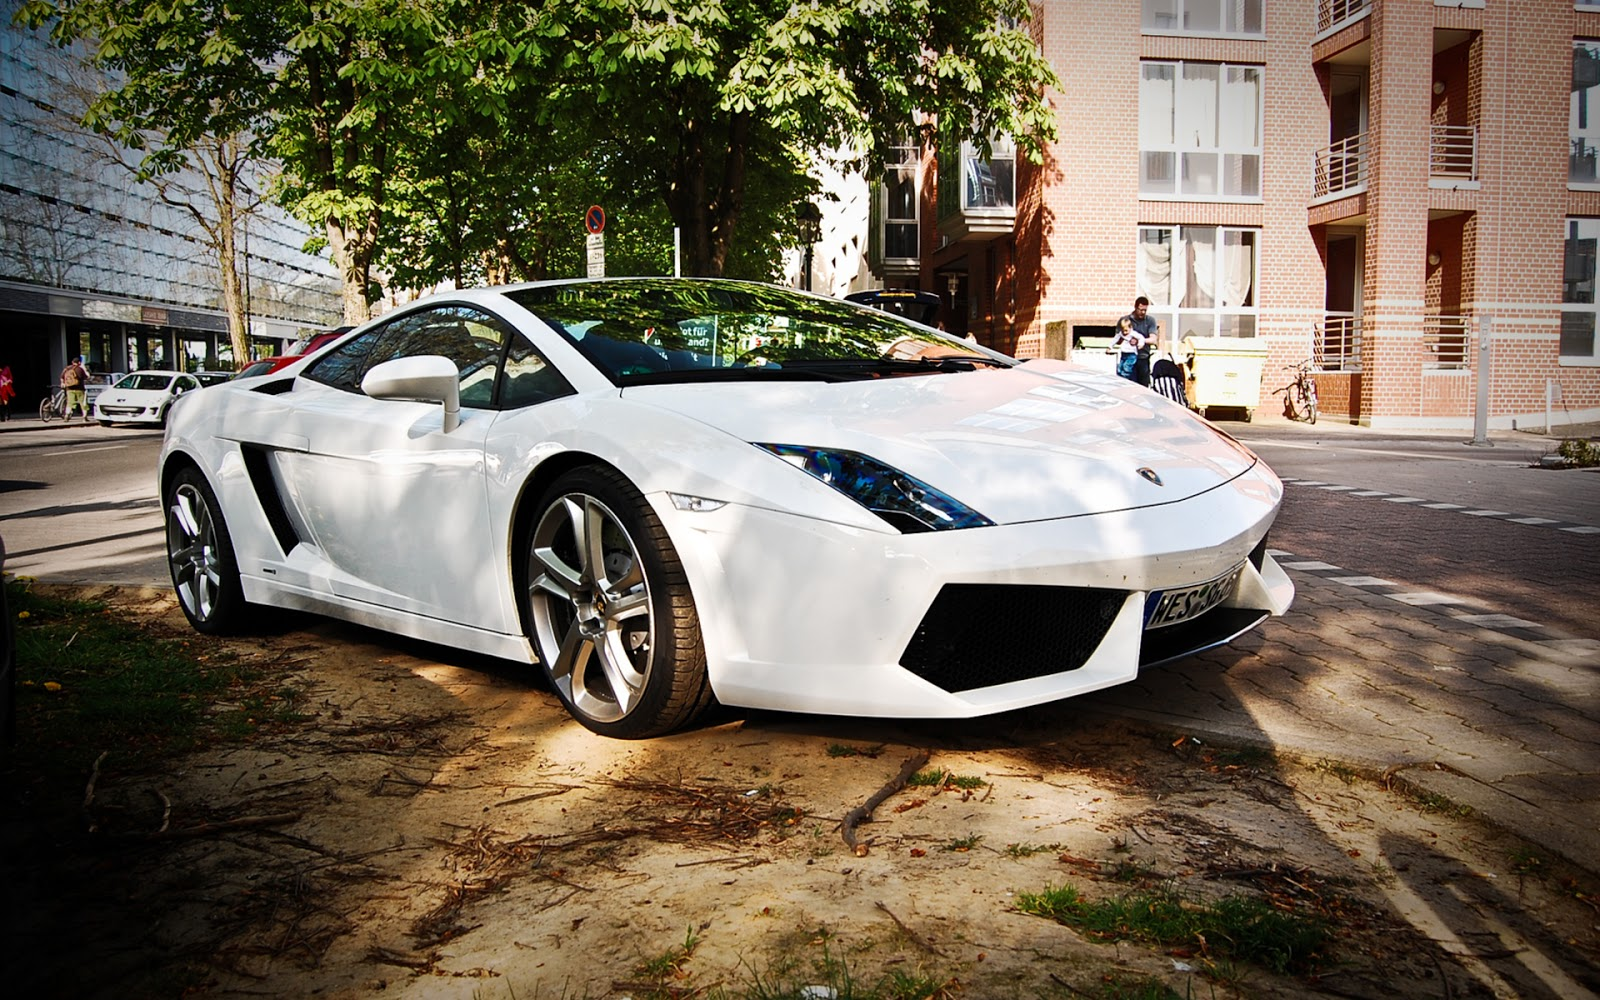 Lamborghini Car Hd Wallpaper For Pc صور سيارات جديدة في أحدث موديلات السيارات ميكساتك